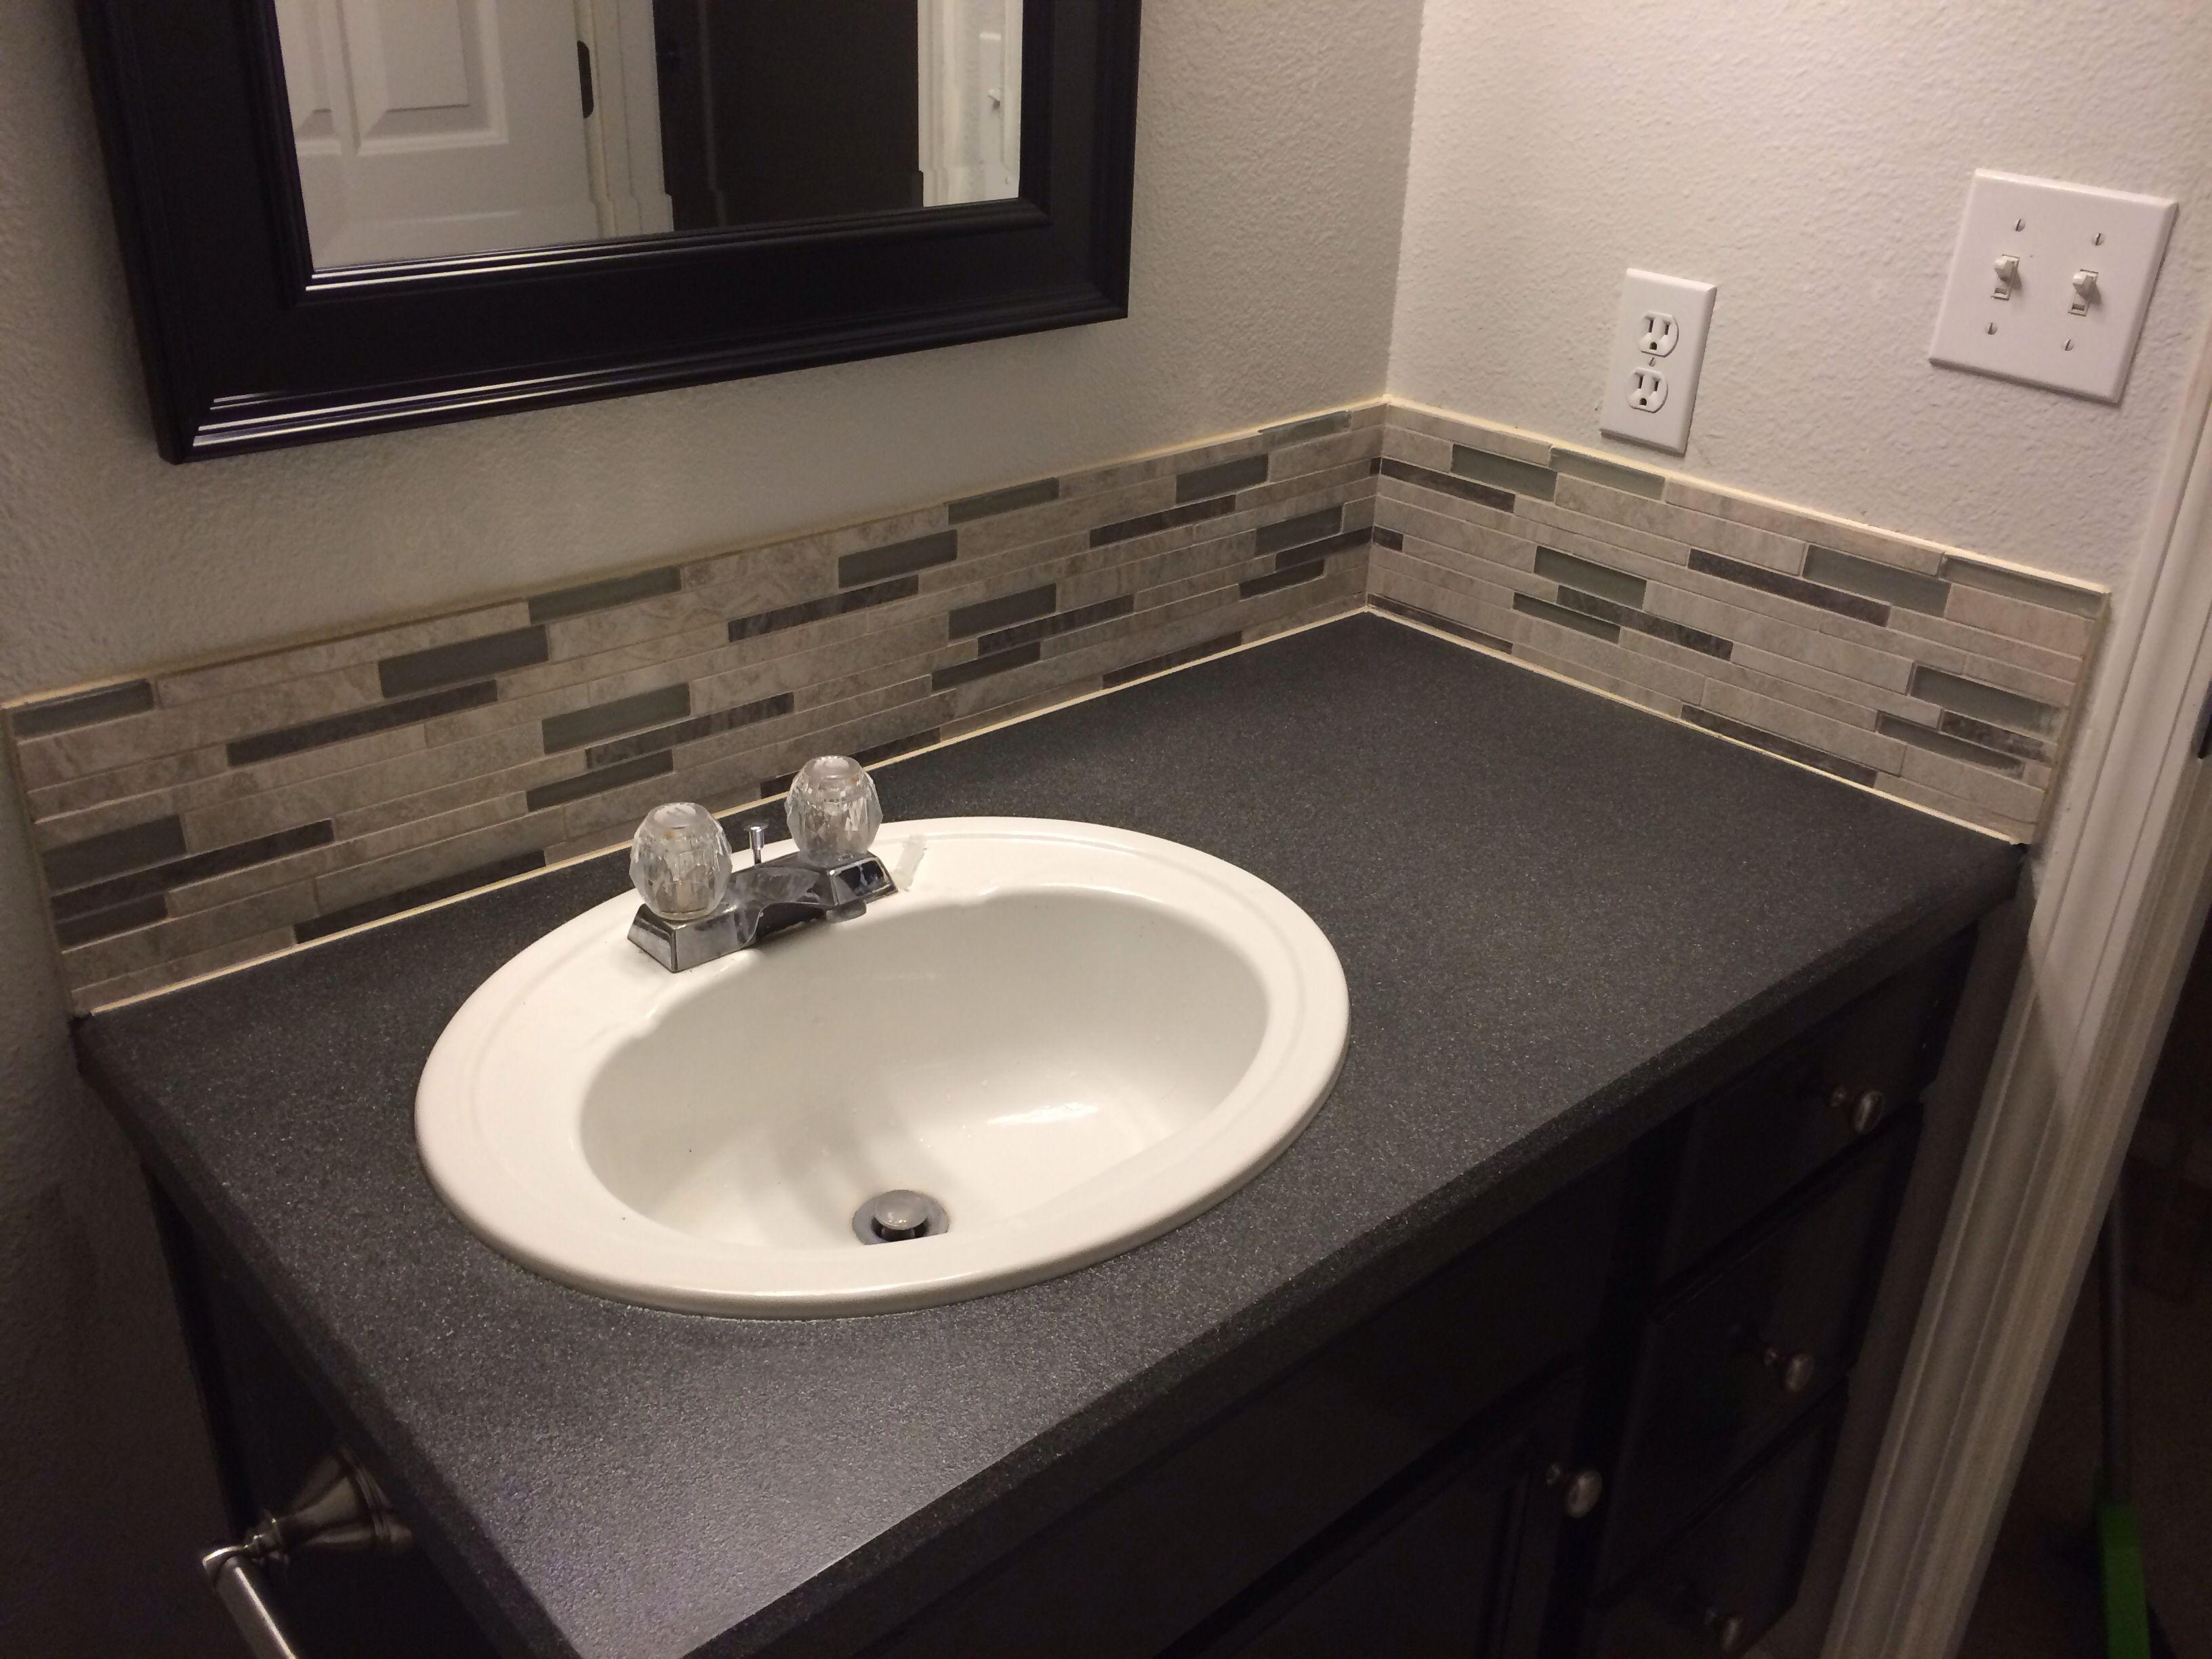 Diy Textured Spray Paint Countertop And Mosaic Backsplash Using A Special Adhesive Mat Instead Bathroom Countertops Diy Backsplash Designs Metallic Backsplash